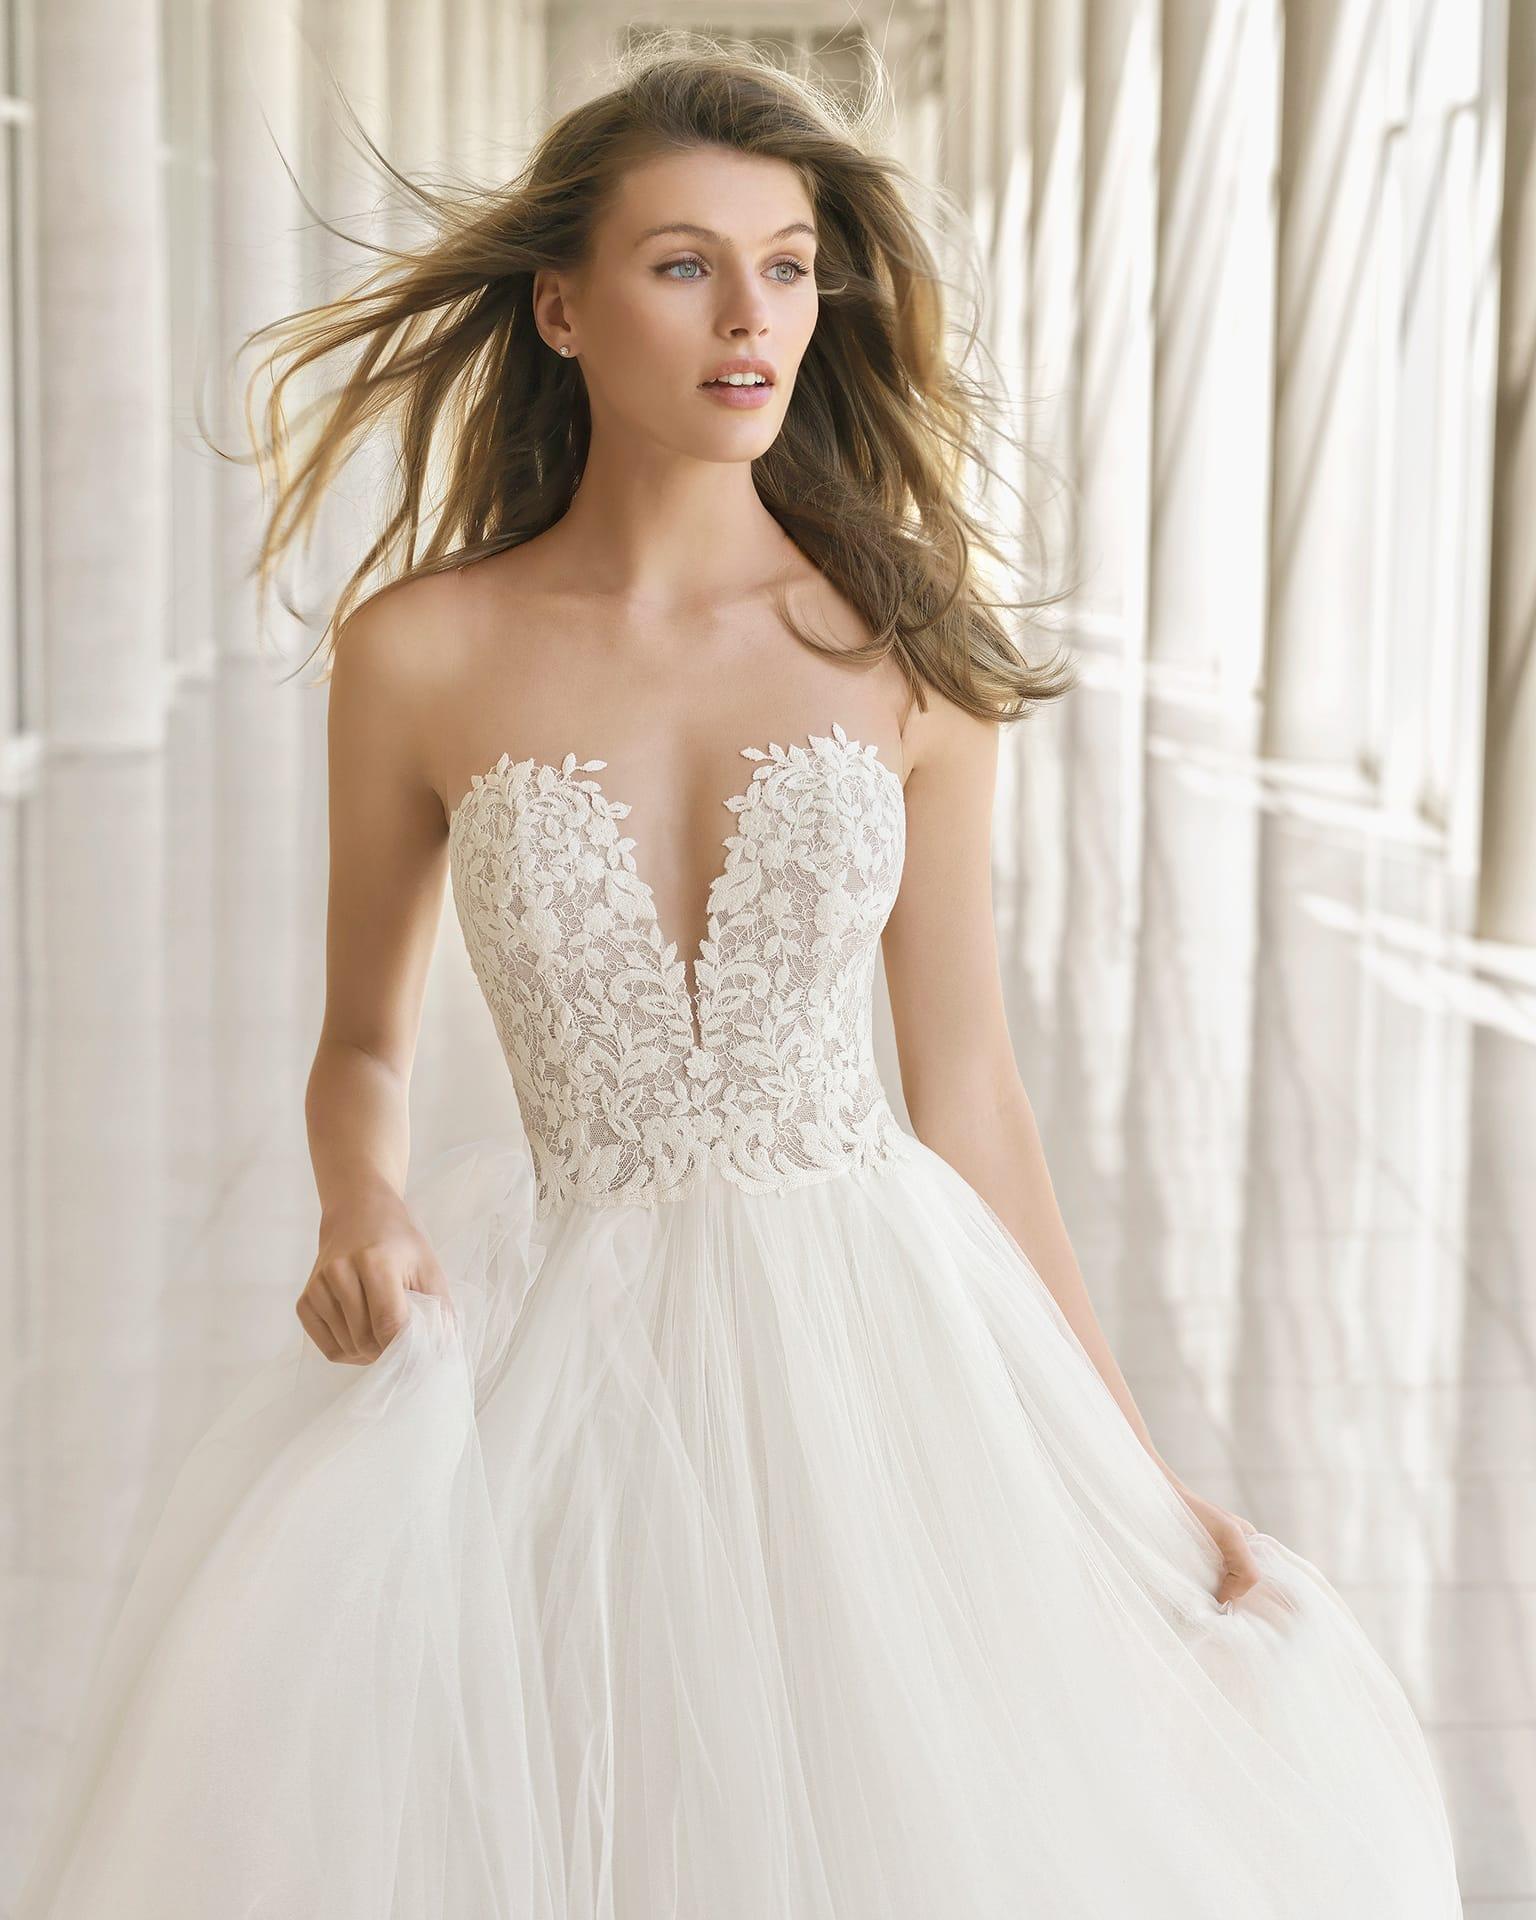 64cefc5660 Rosa Clara Poeta   Petunia Gown - Sell My Wedding Dress Online ...